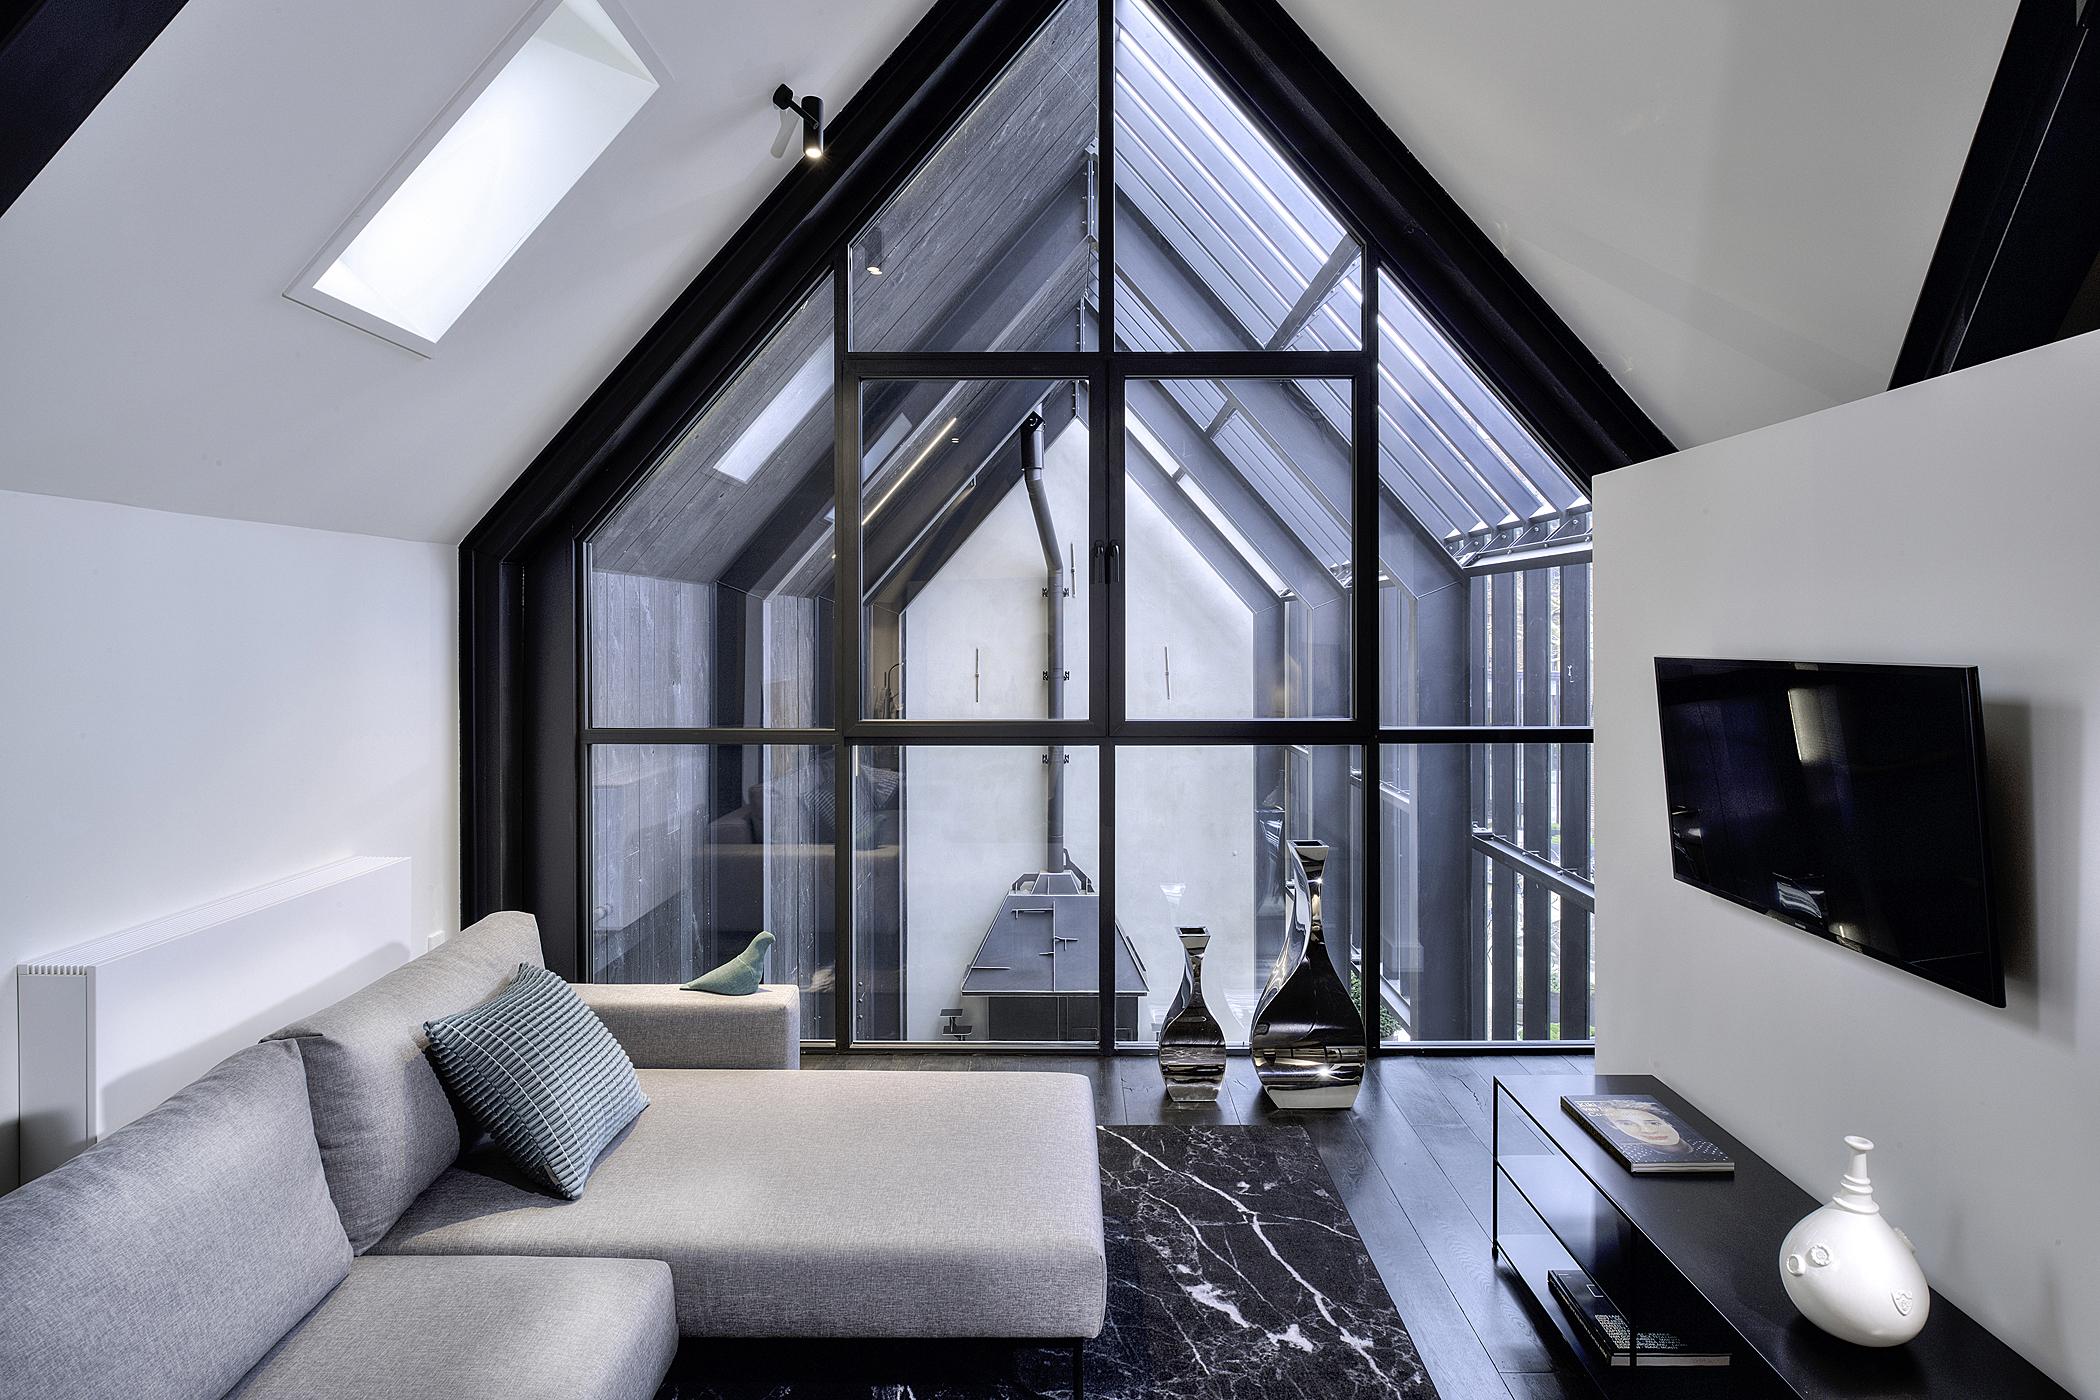 Kazerne Paljas Loft Living Image Patrick Meis